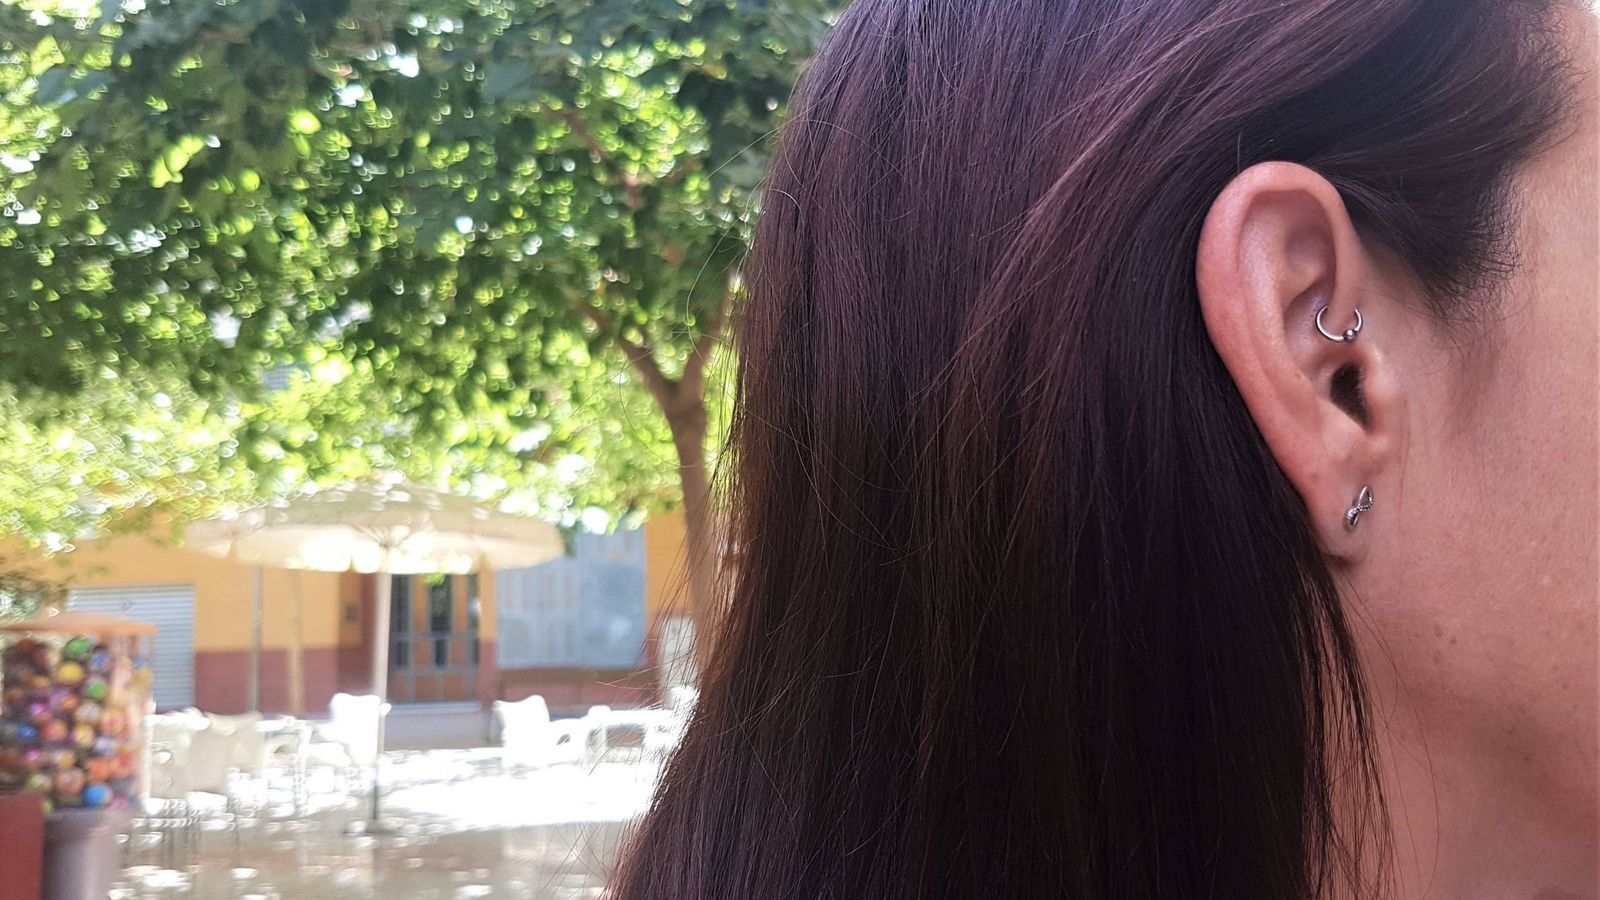 16b4cb9c6e9c Daith piercing